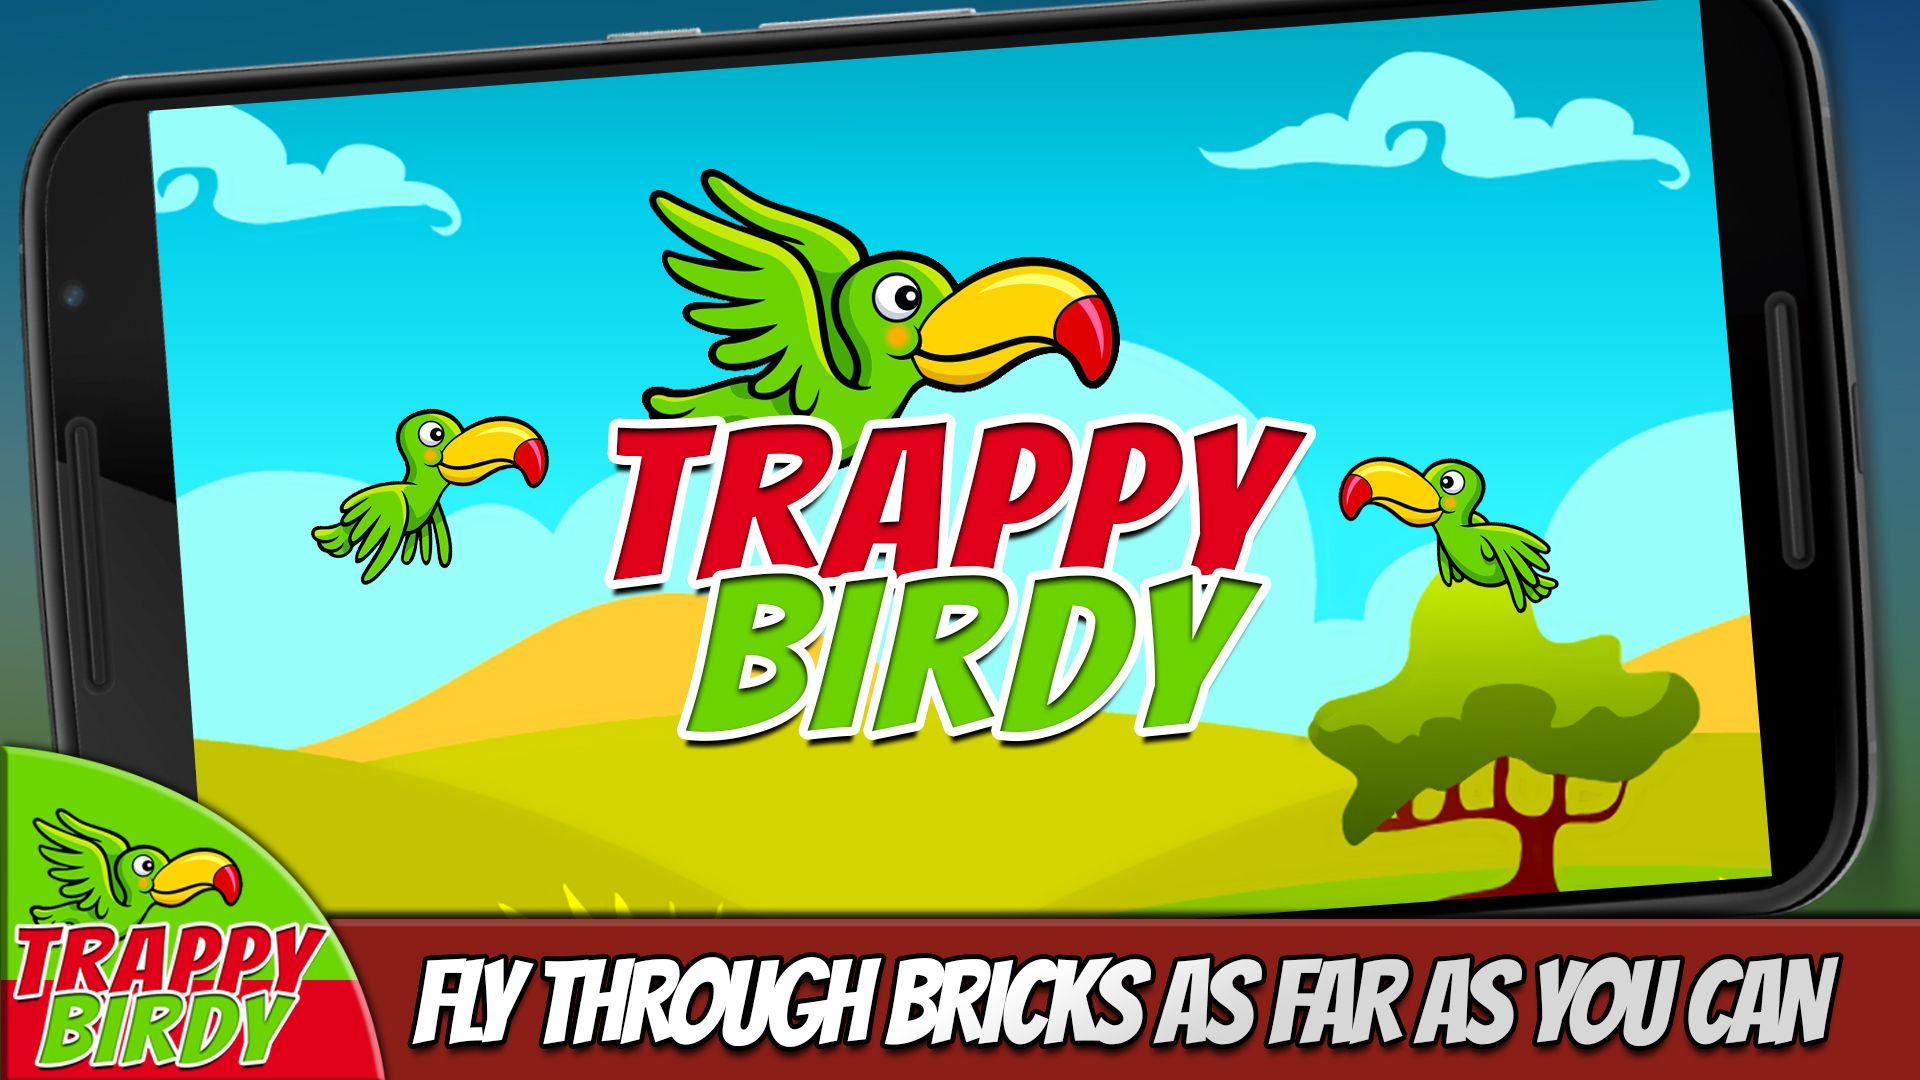 Trappy Birdy Addictive Game Addicting games